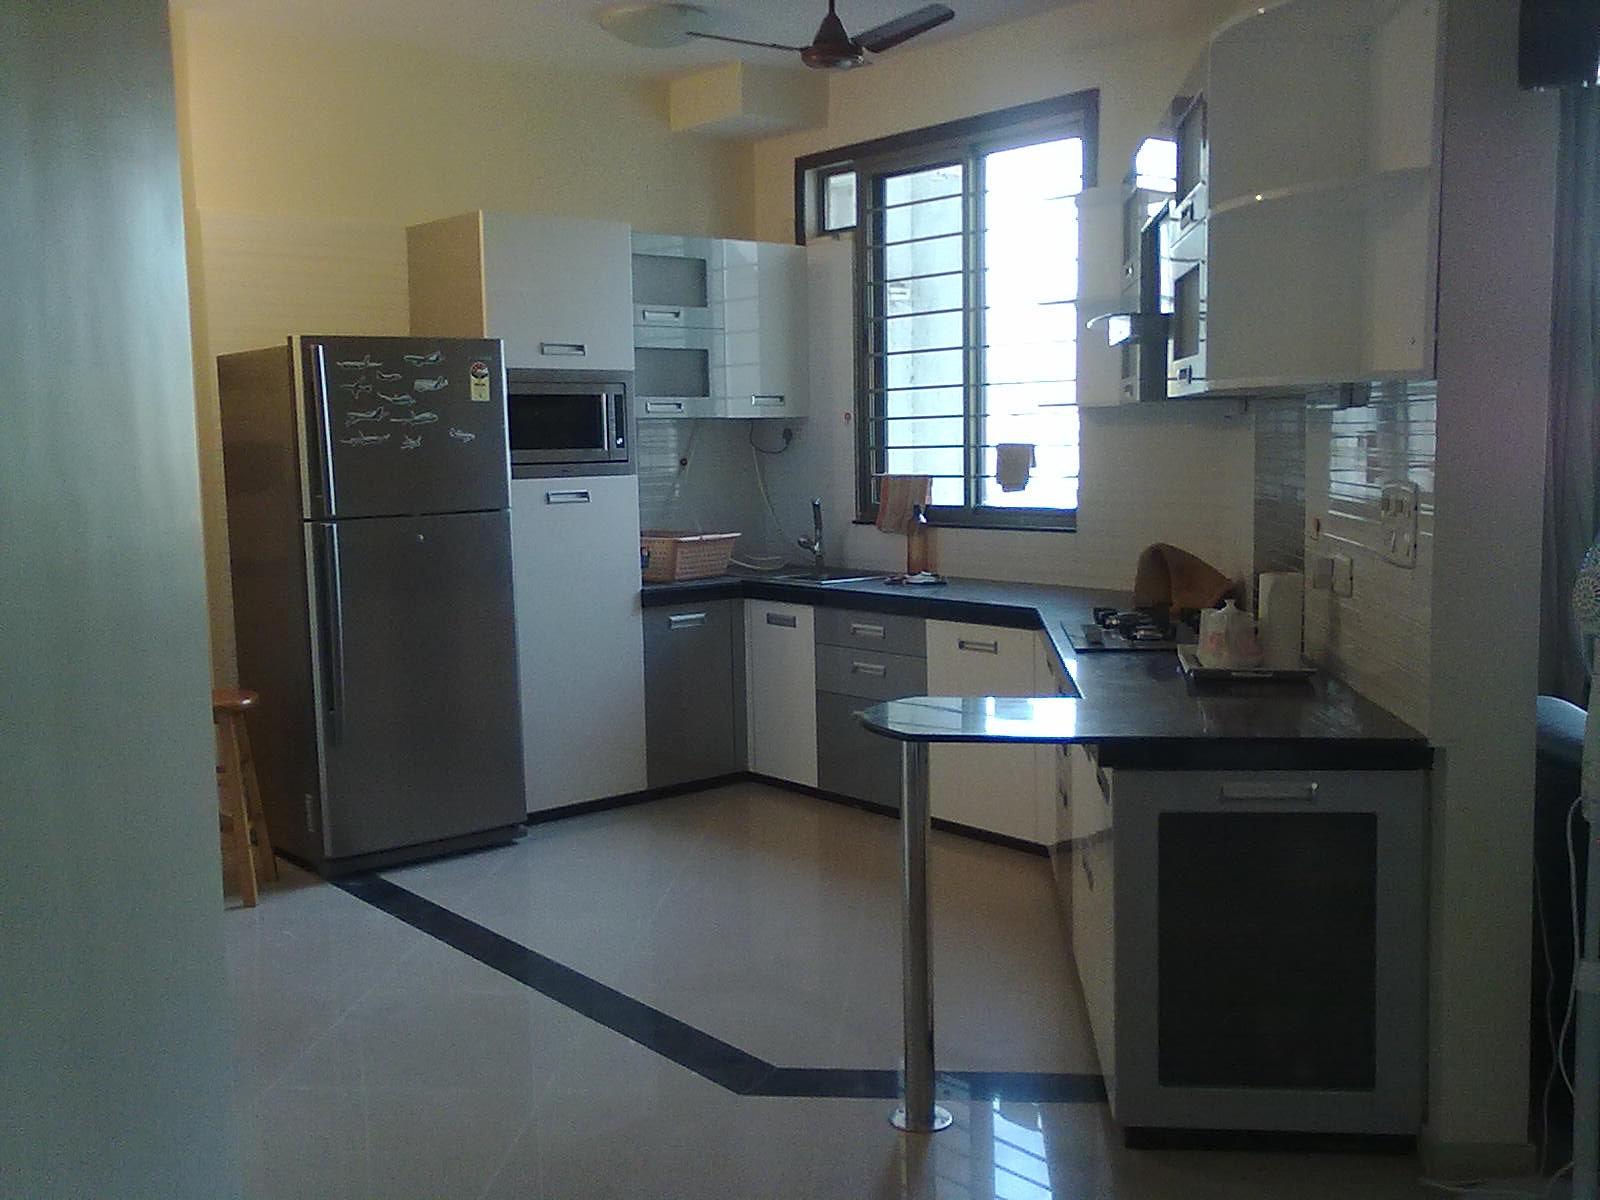 Modular kitchen mumbai laviishups 27042011987g create your wix site you can do it yourself start now solutioingenieria Gallery